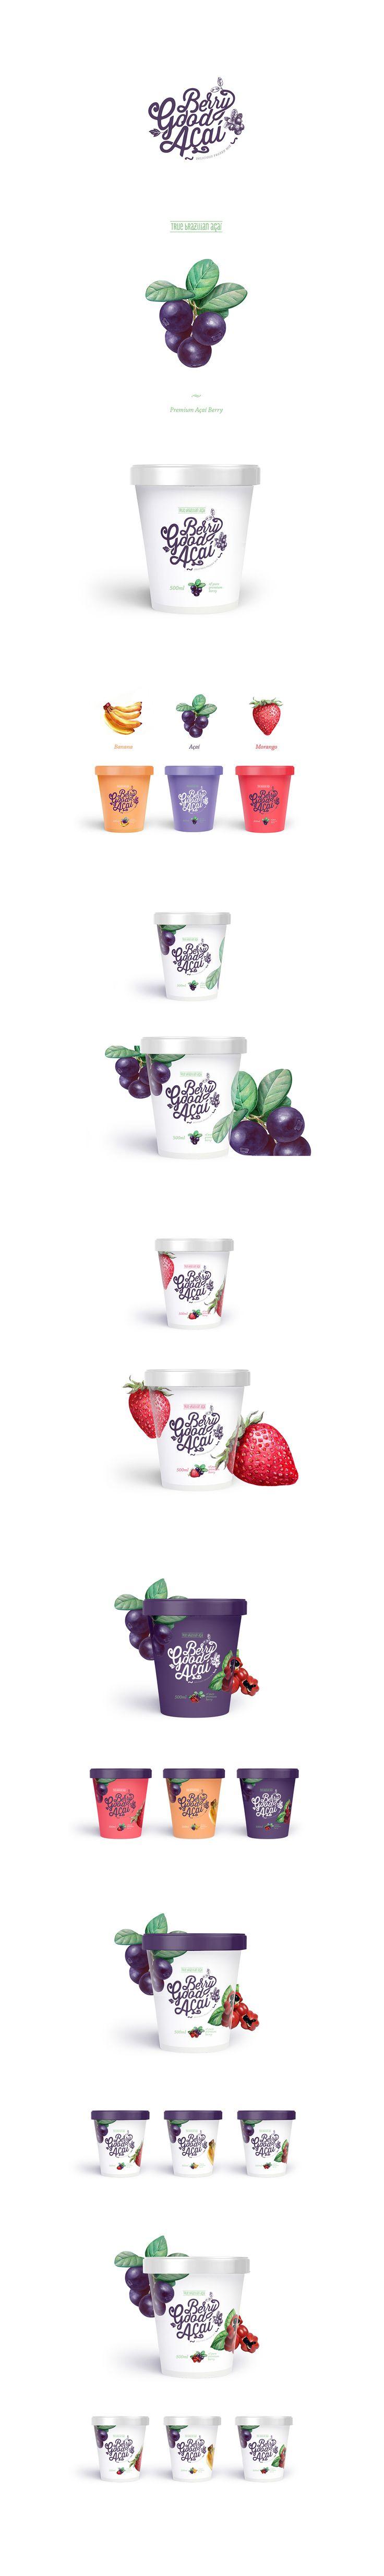 Berry Good Açaí frozen mix by on Brain&Bros DZ. Source: Packaging Design Served. #SFields99 #packaging #design